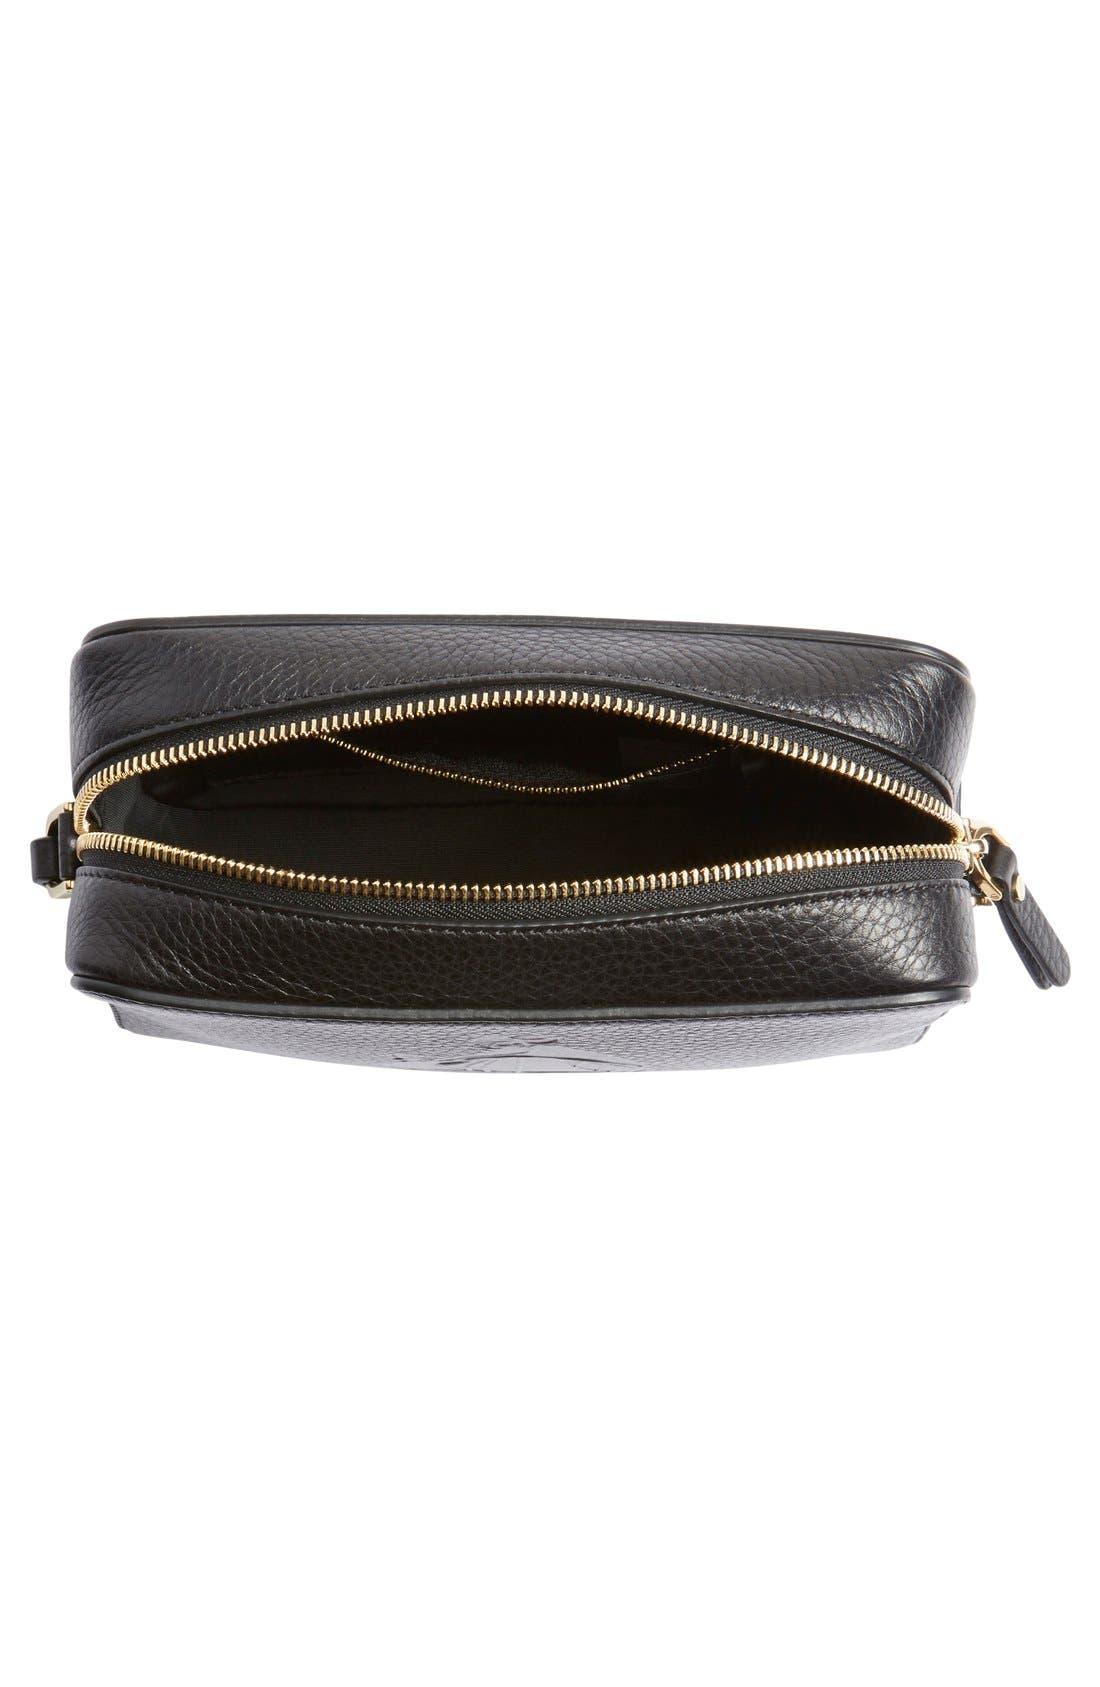 'Nomad' Leather Camera Bag,                             Alternate thumbnail 5, color,                             001